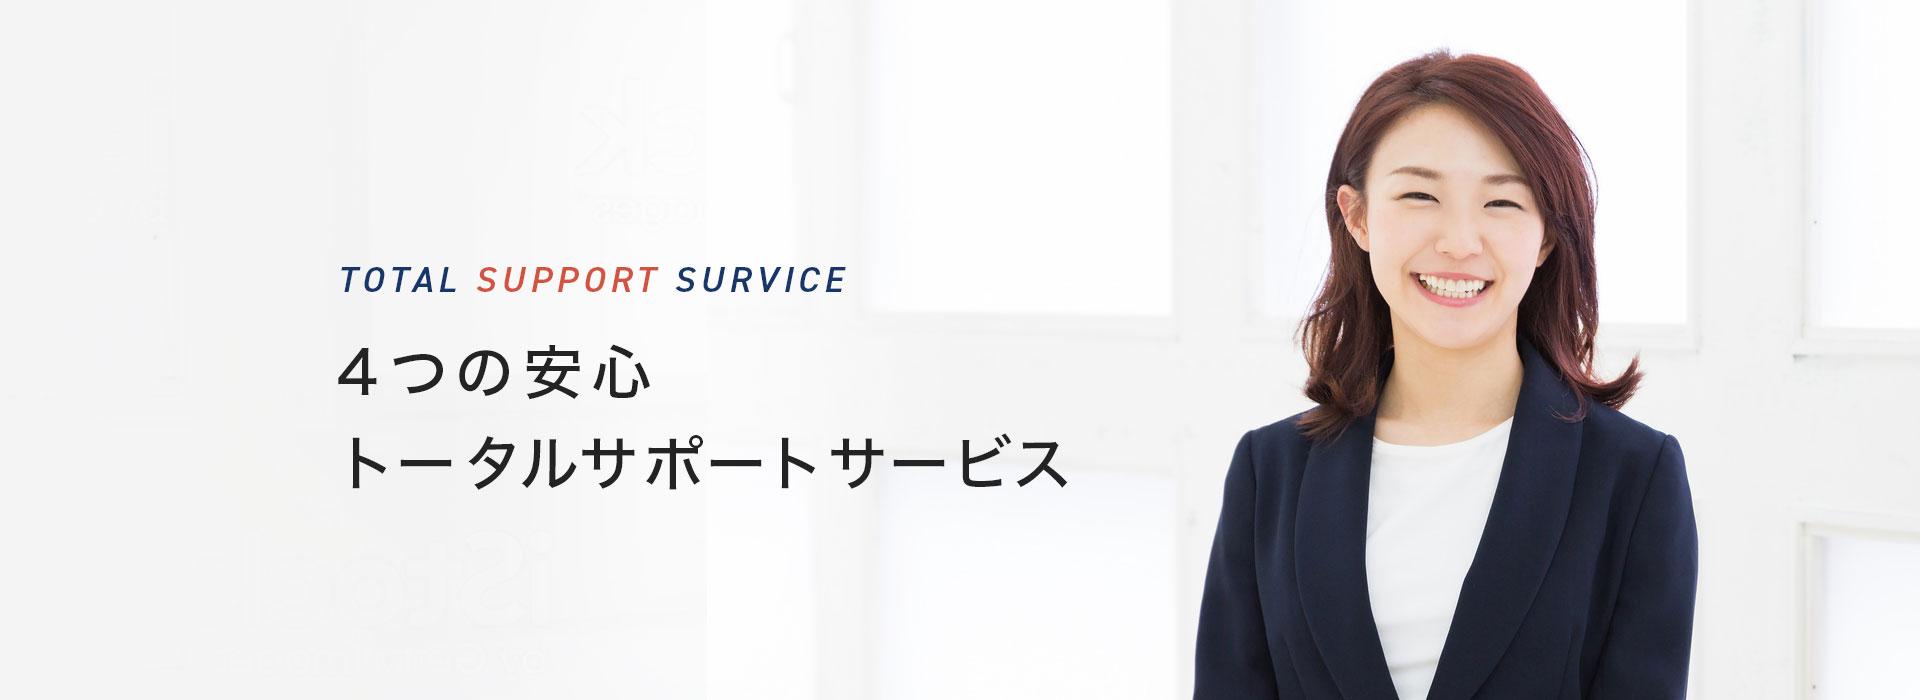 TOTAL SUPPORT SURVICE 4つの安心トータルサポートサービス